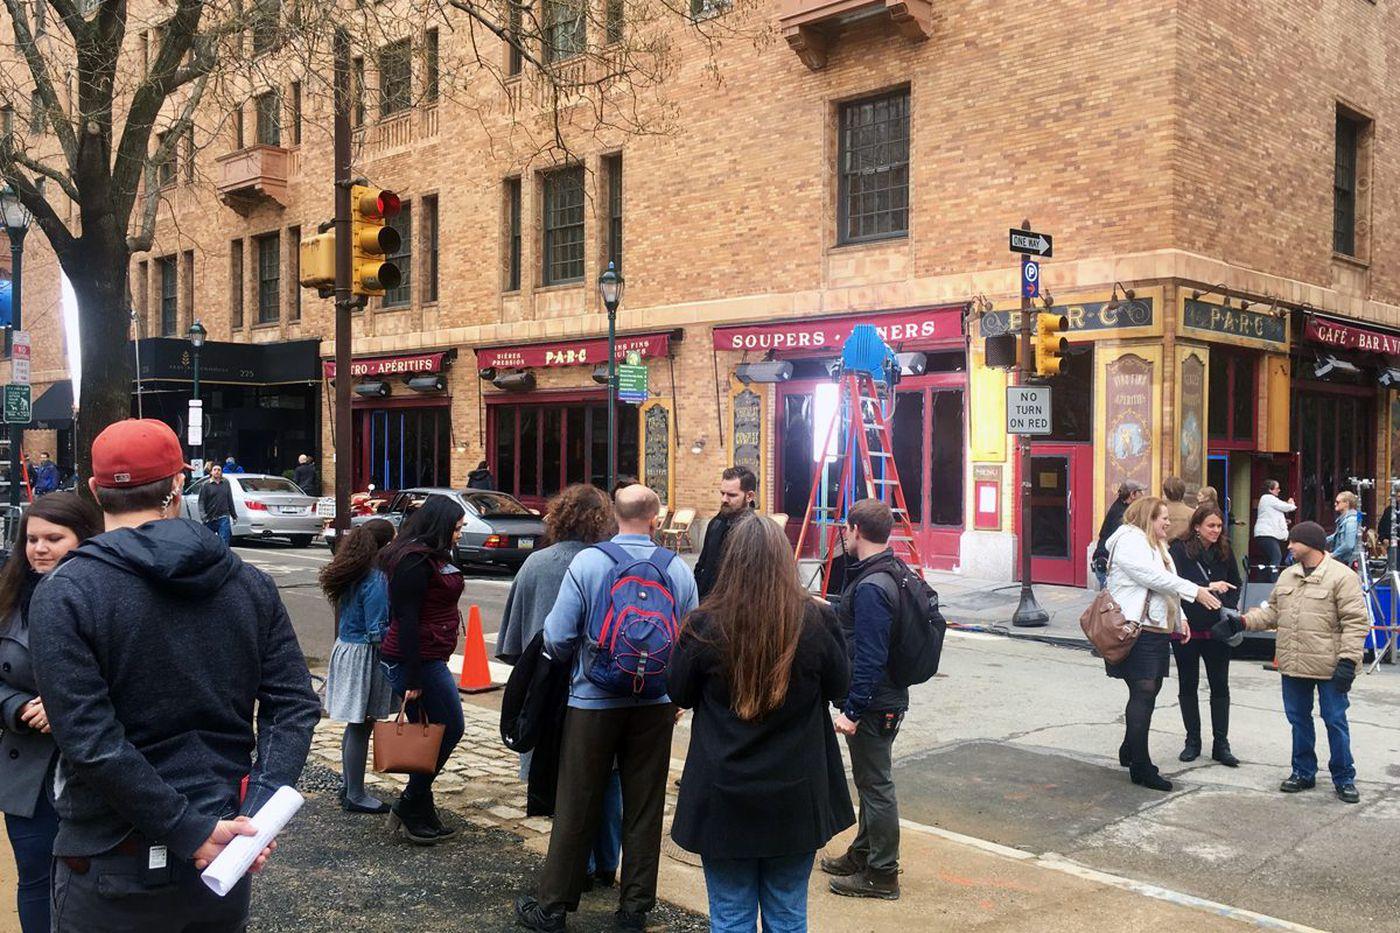 M. Night Shyamalan's 'Glass' filming scene in Rittenhouse Square today